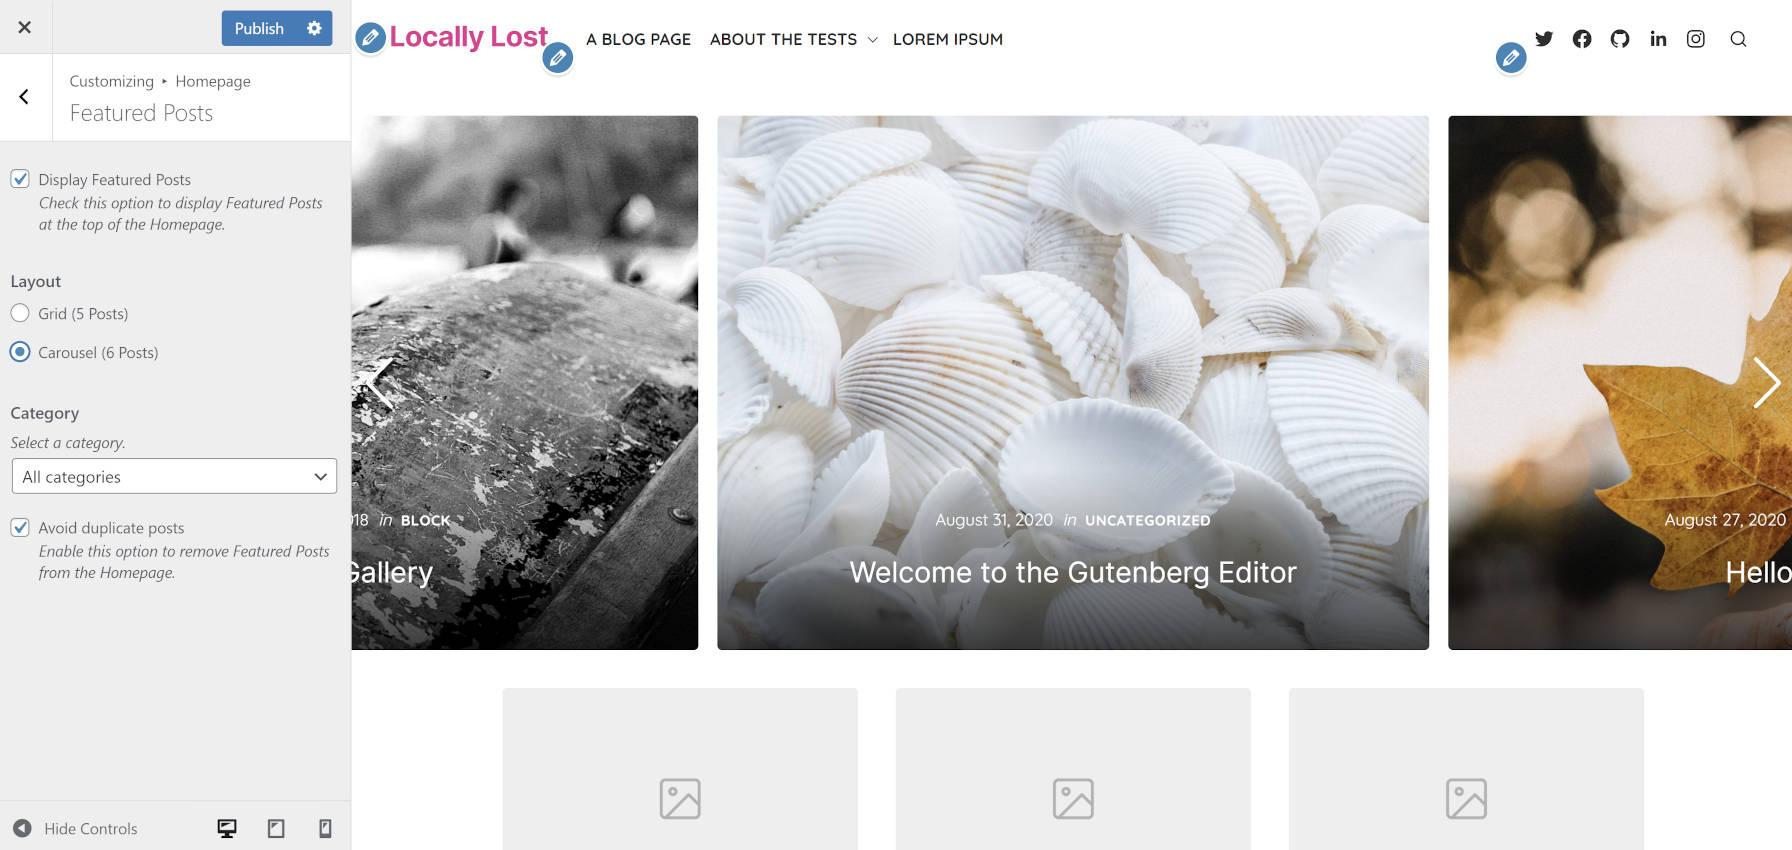 design-lab-releases-artpop-a-block-ready-wordpress-theme-3设计实验室发布Artpop,这是一个Block-ready WordPress主题